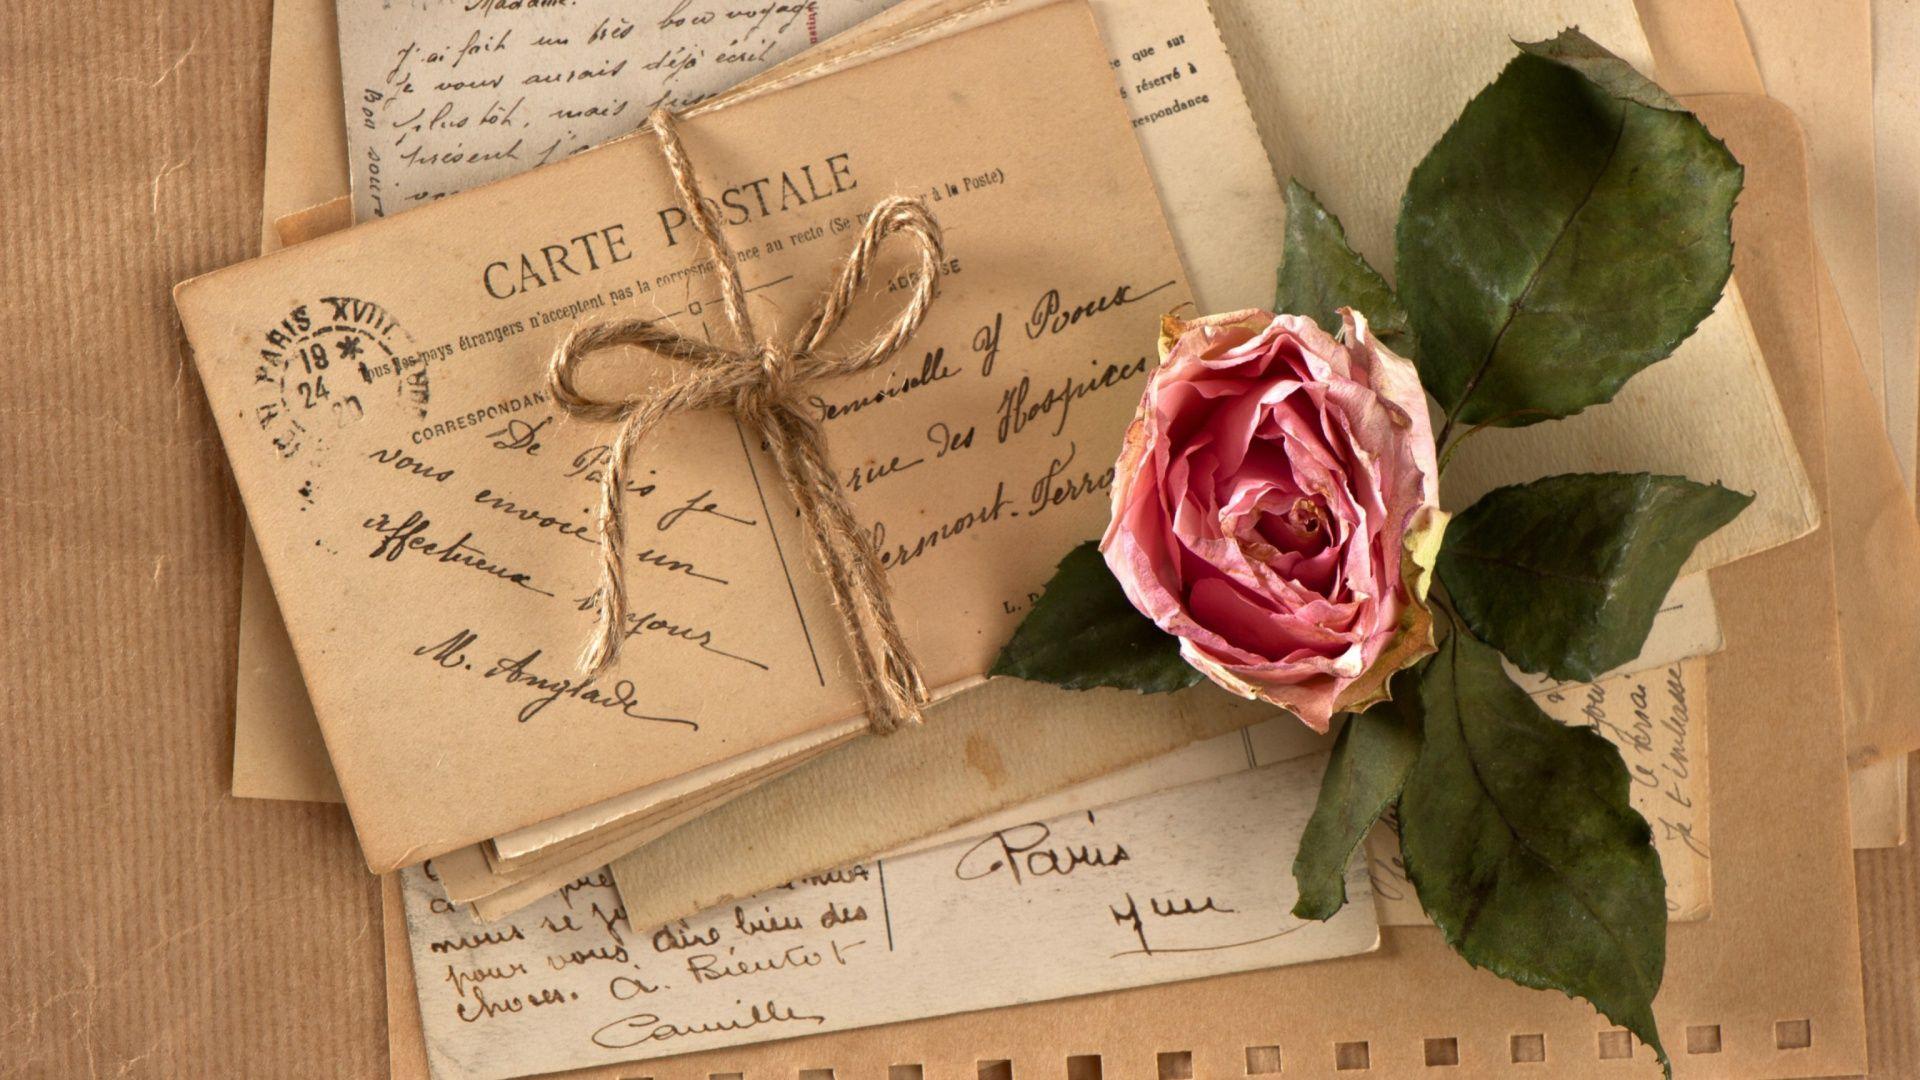 Stari romantični dnevnici,pisma,albumi,knjige - Page 9 F1ee99de1351e805888d98401b4cbfac